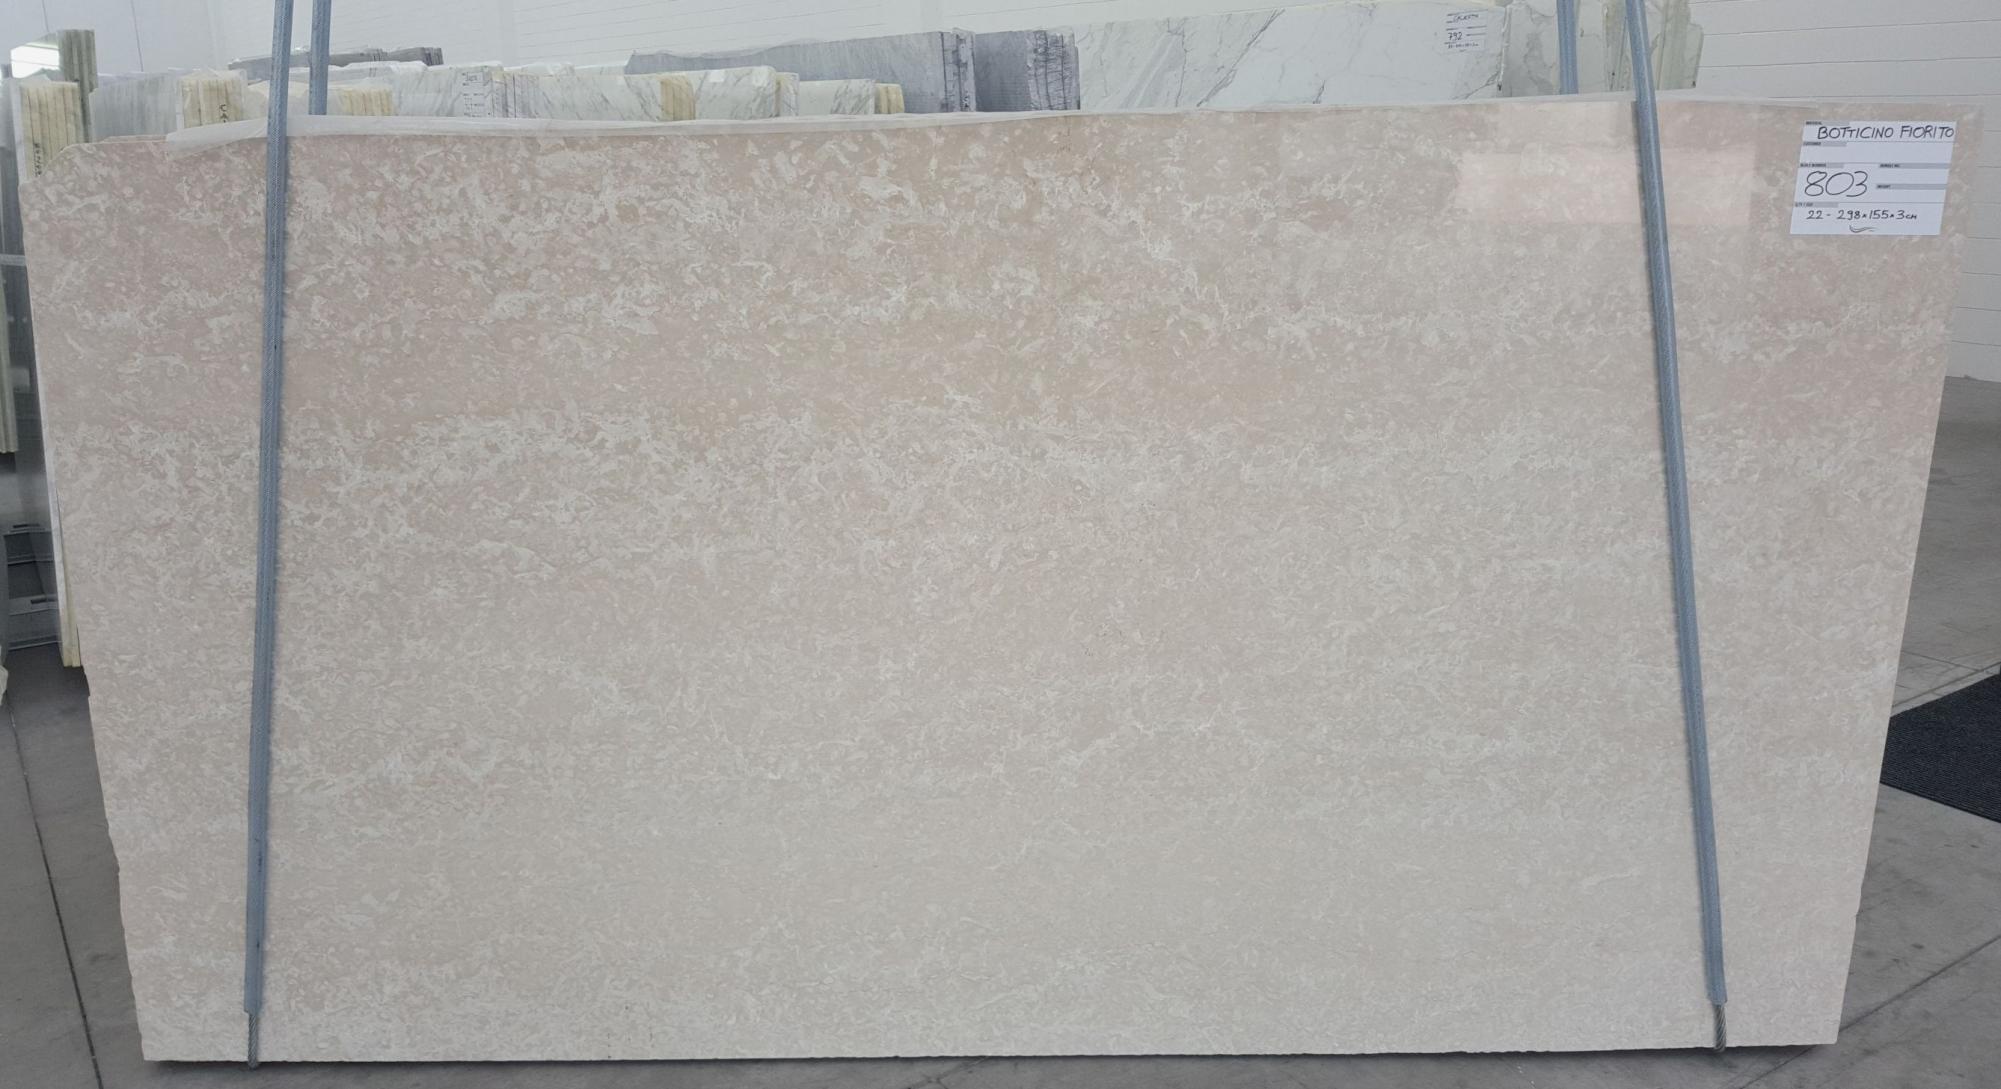 BOTTICINO FIORITO LIGHT Fourniture (Italie) d' dalles brillantes en marbre naturel 1149 , Bundle #1-2